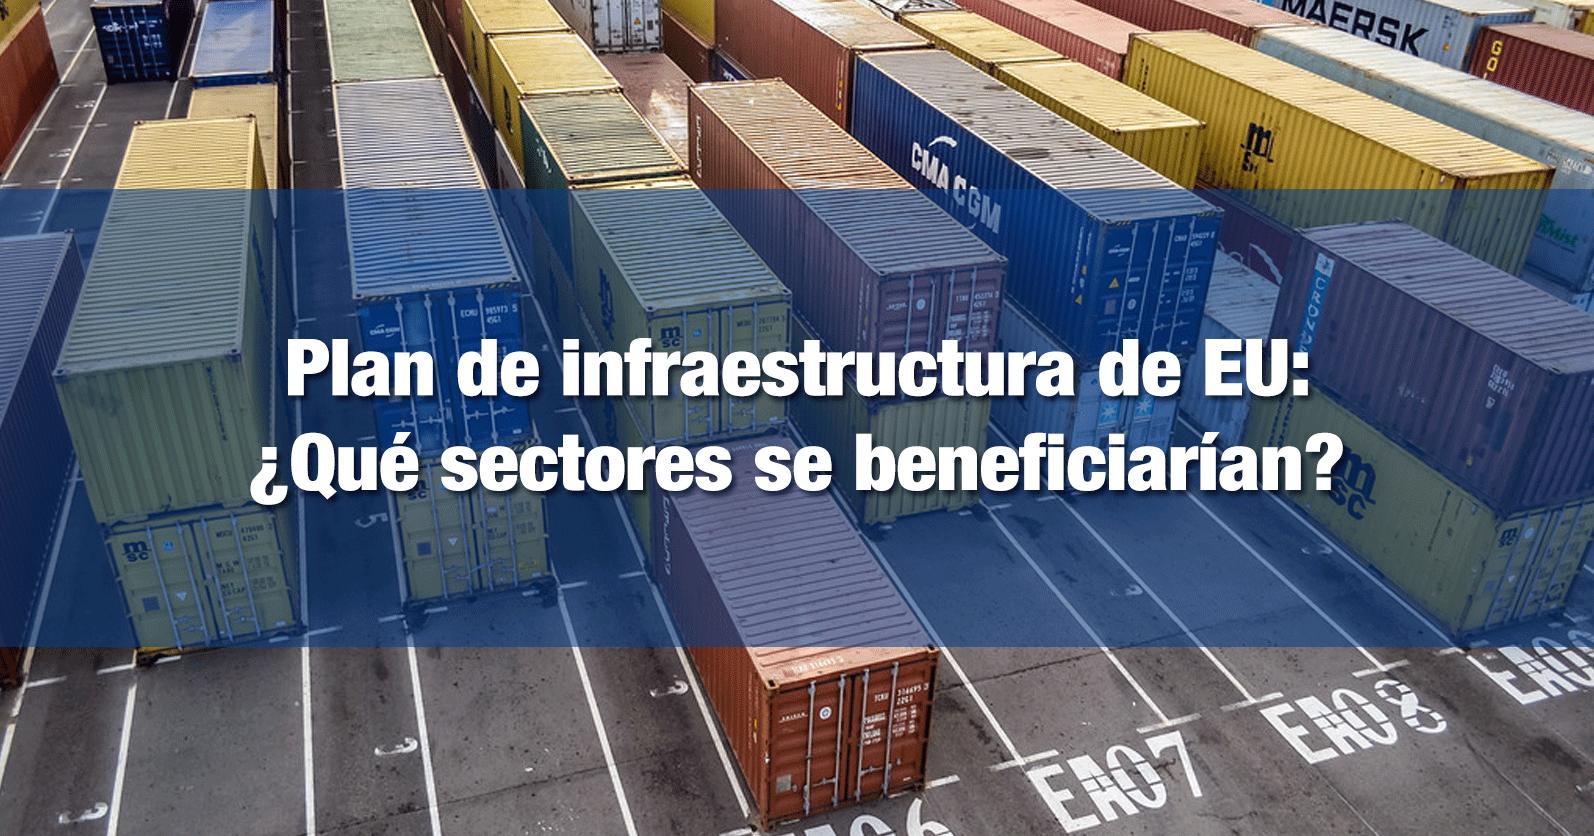 Plan de infraestructura de EU: ¿Qué sectores se beneficiarían?